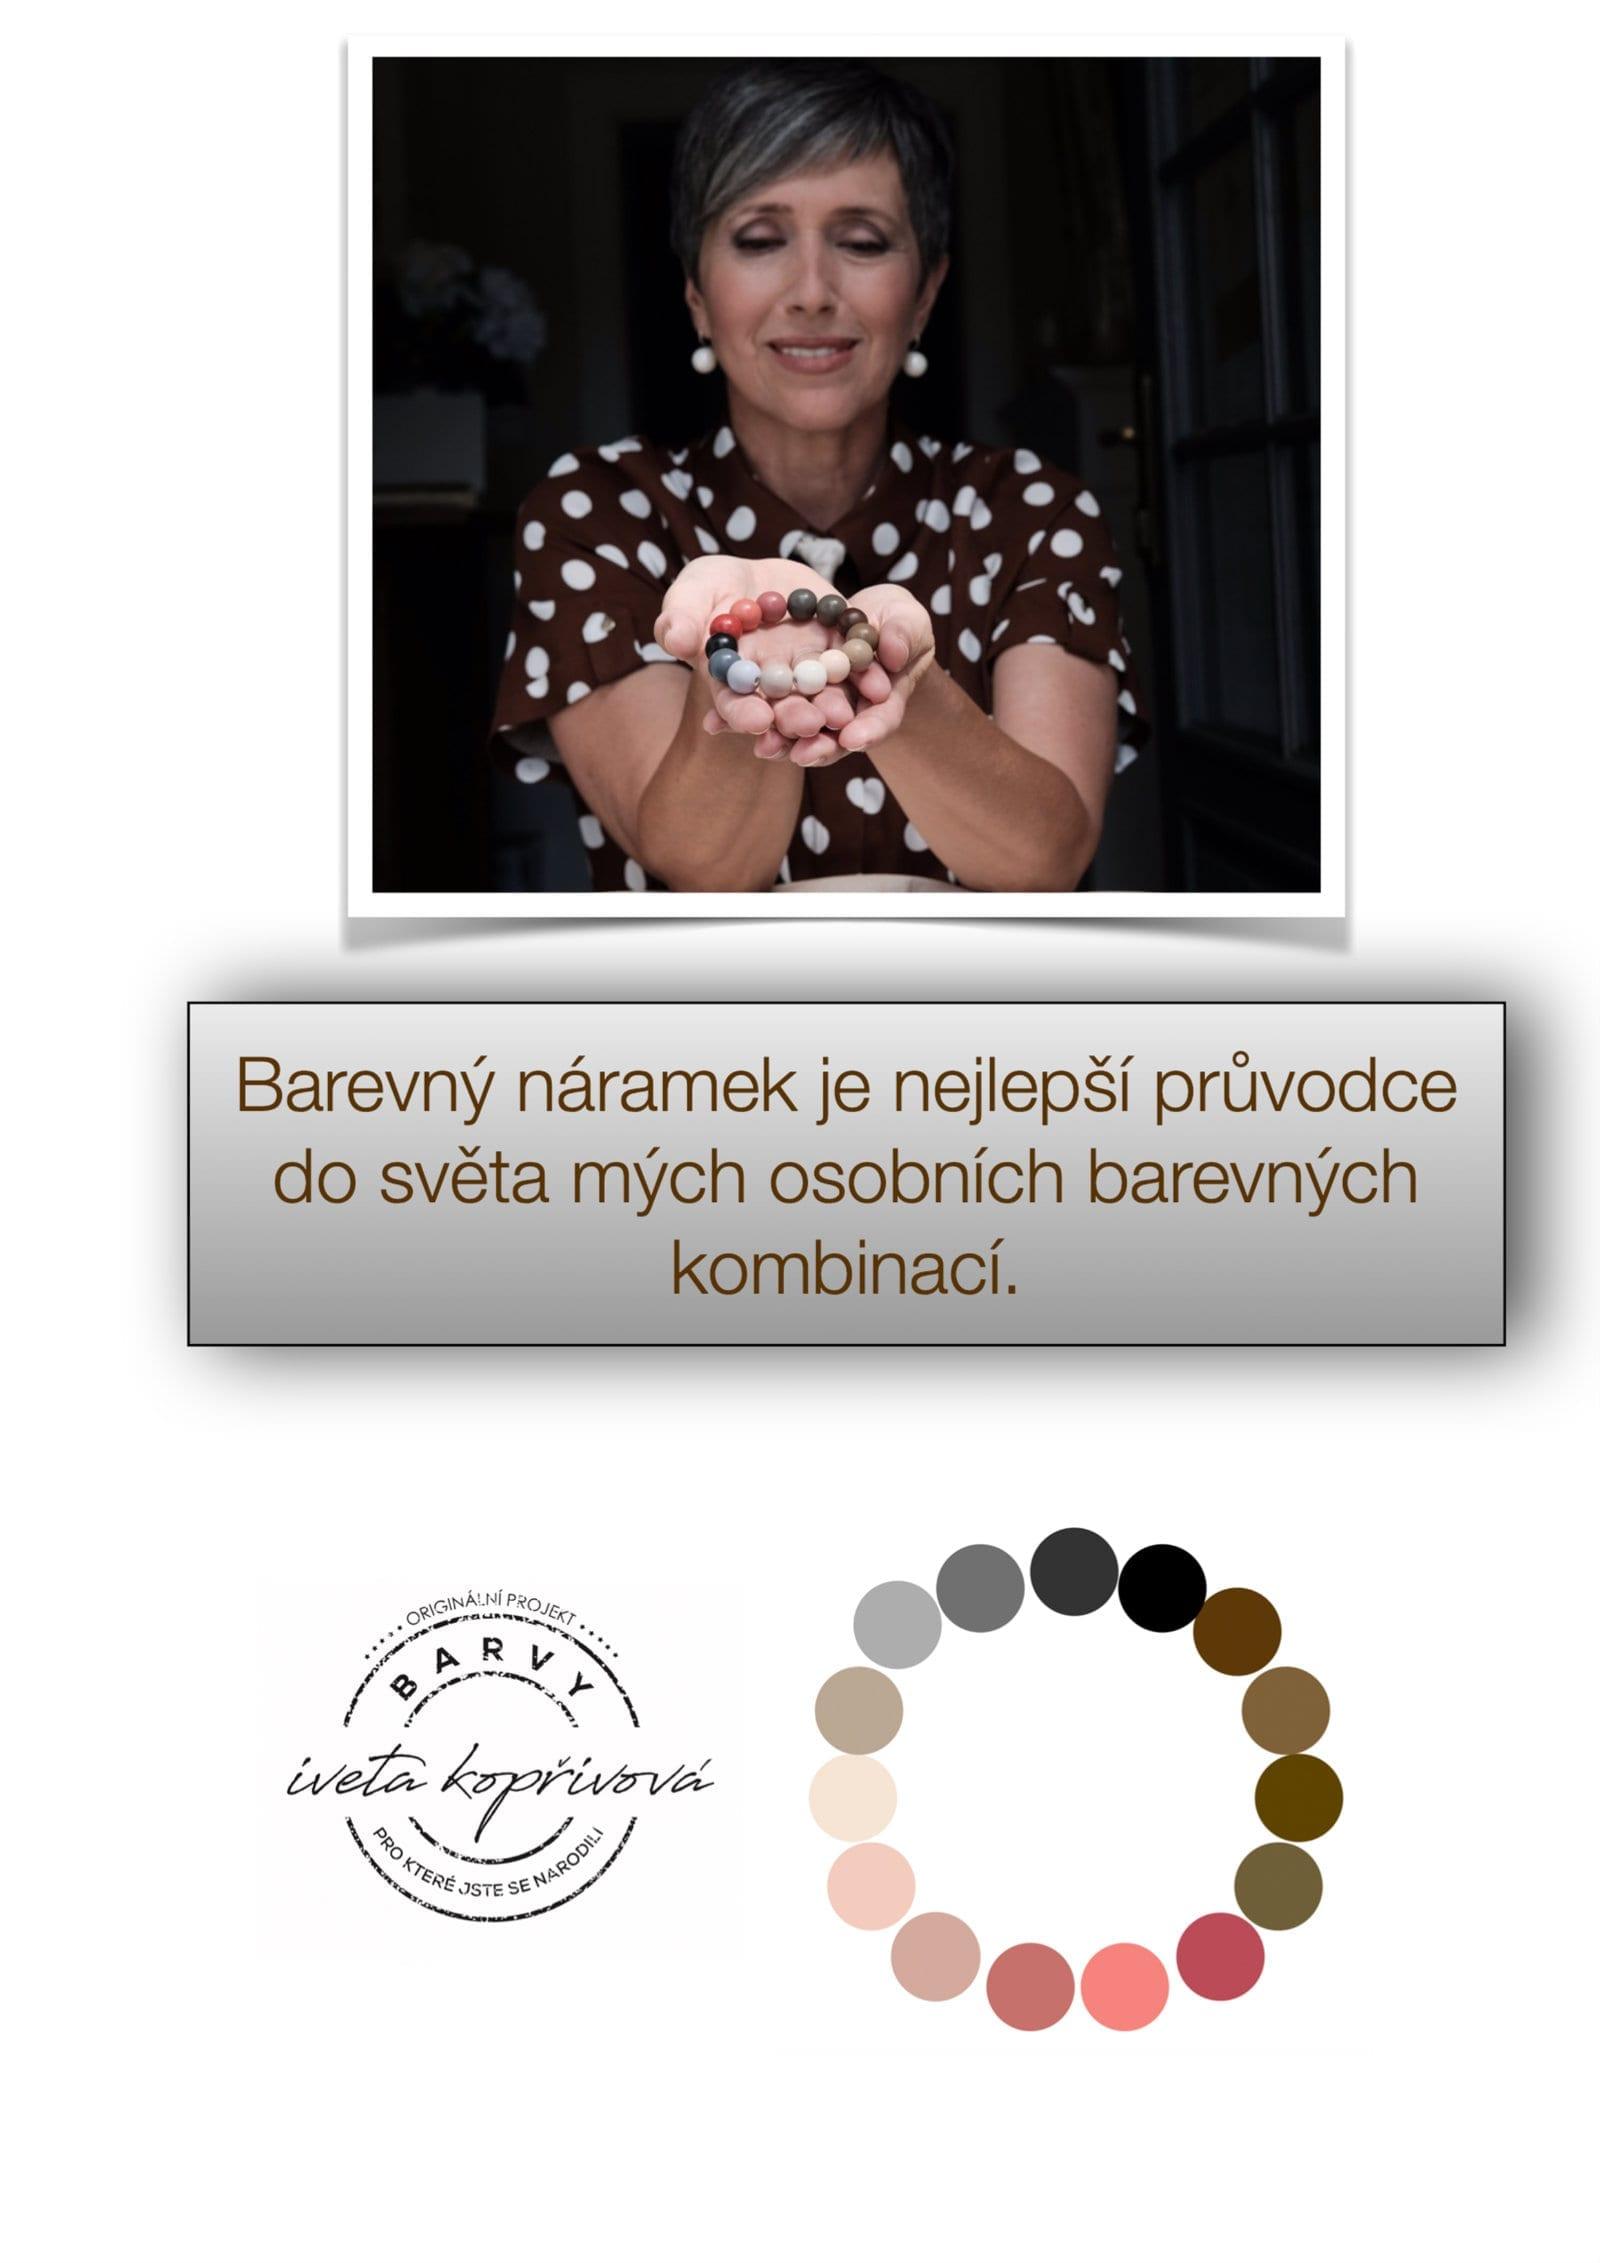 Barevny naramek je nejlepsi pruvodce do sveta barevnych kombinaci